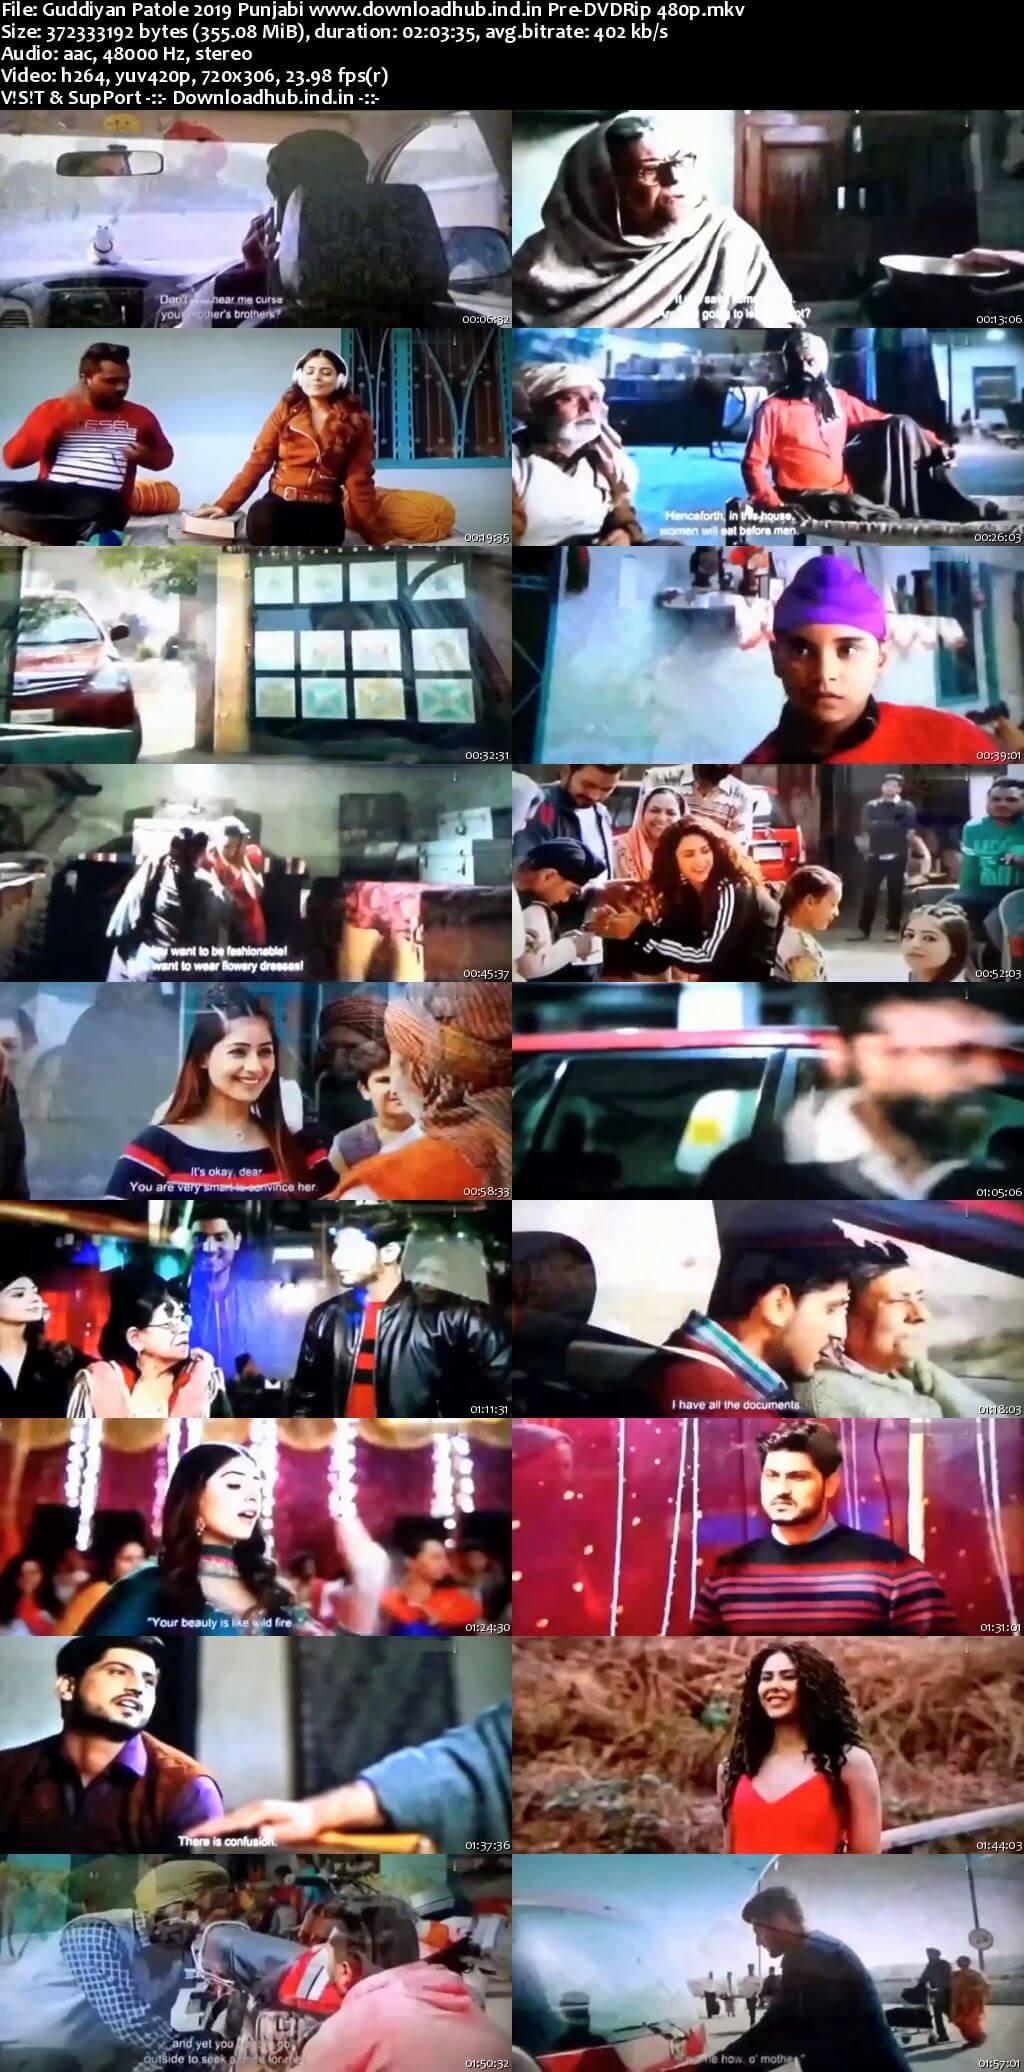 Guddiyan Patole 2019 Punjabi 350MB Pre-DVDRip 480p